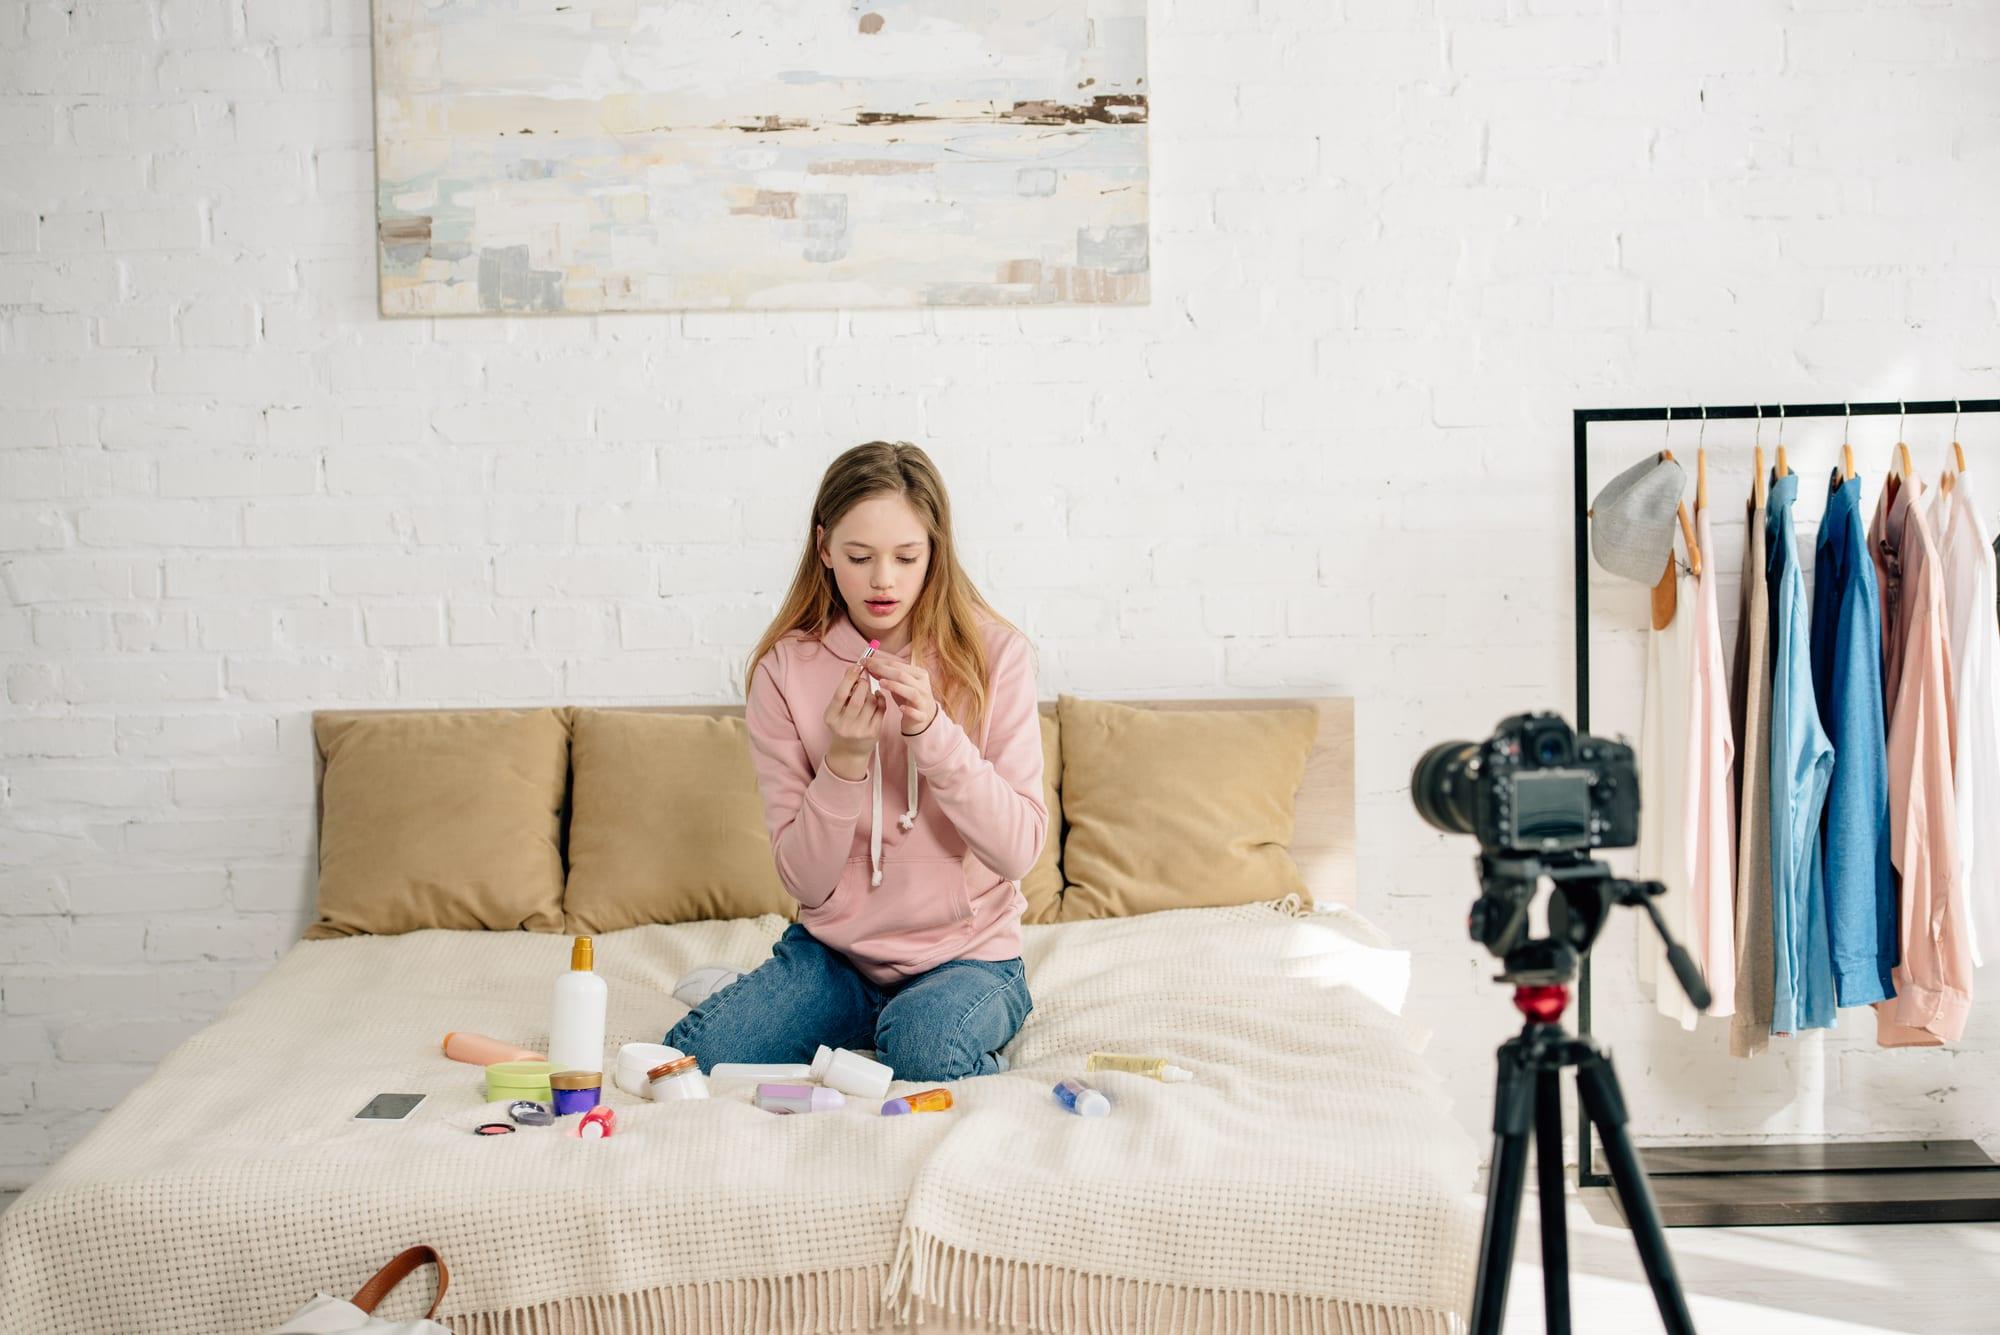 Female Student Vlogging about make up